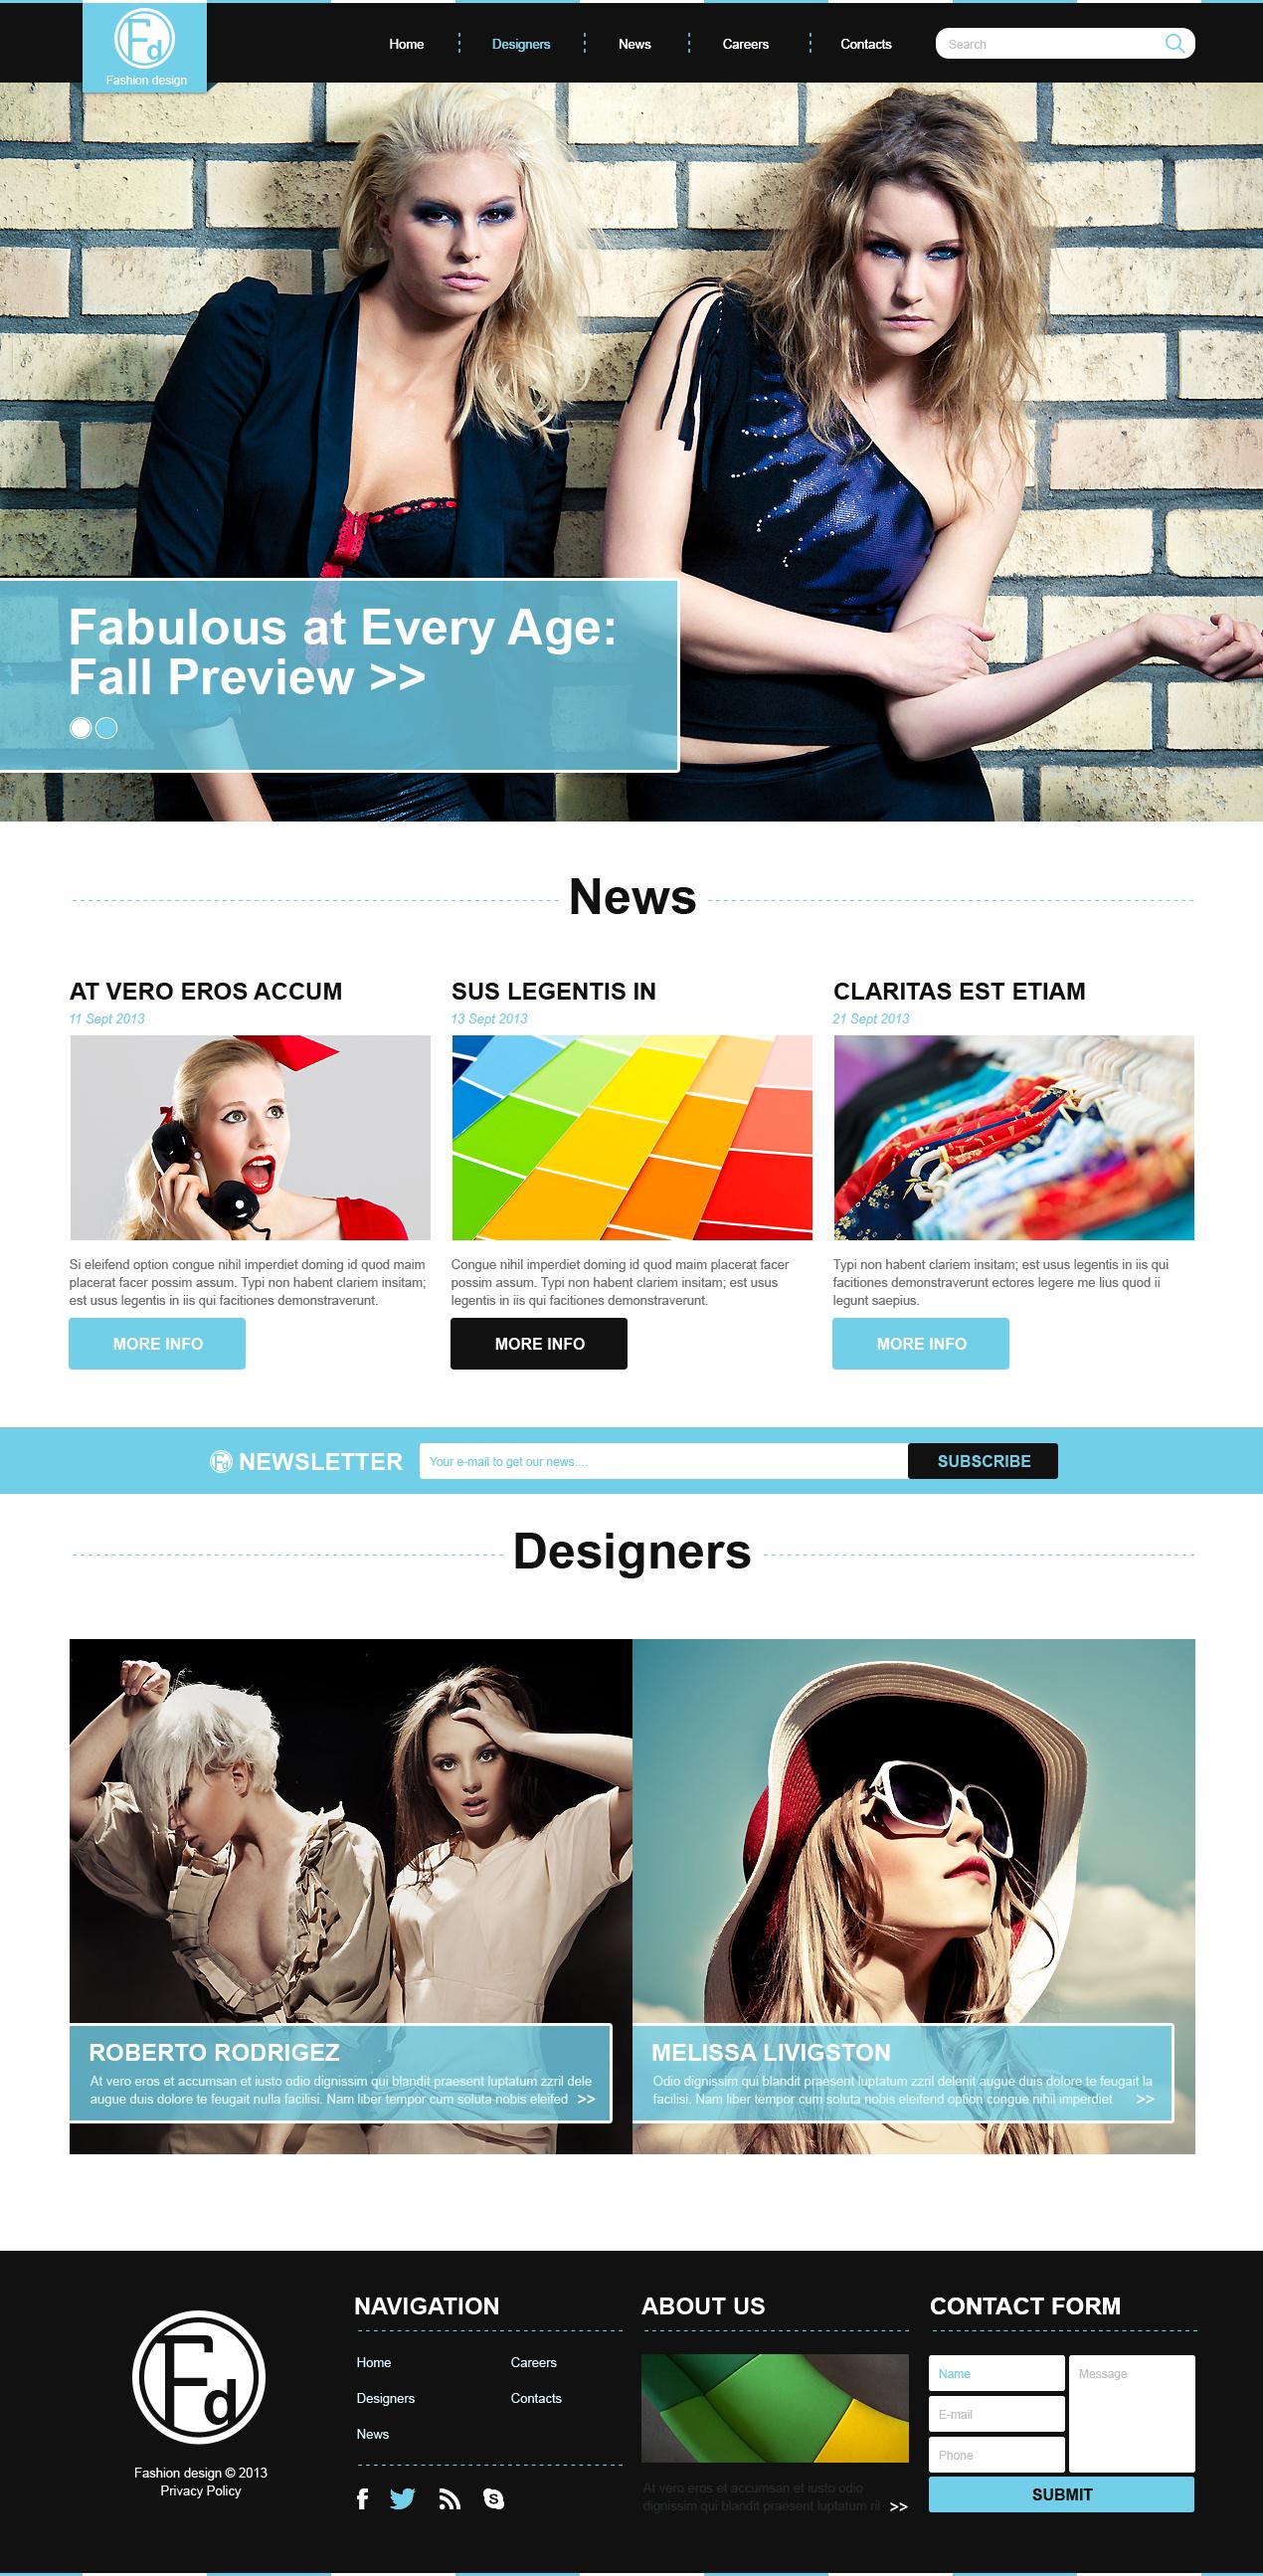 Responsywny szablon Joomla Fashion Design School #47945 - zrzut ekranu